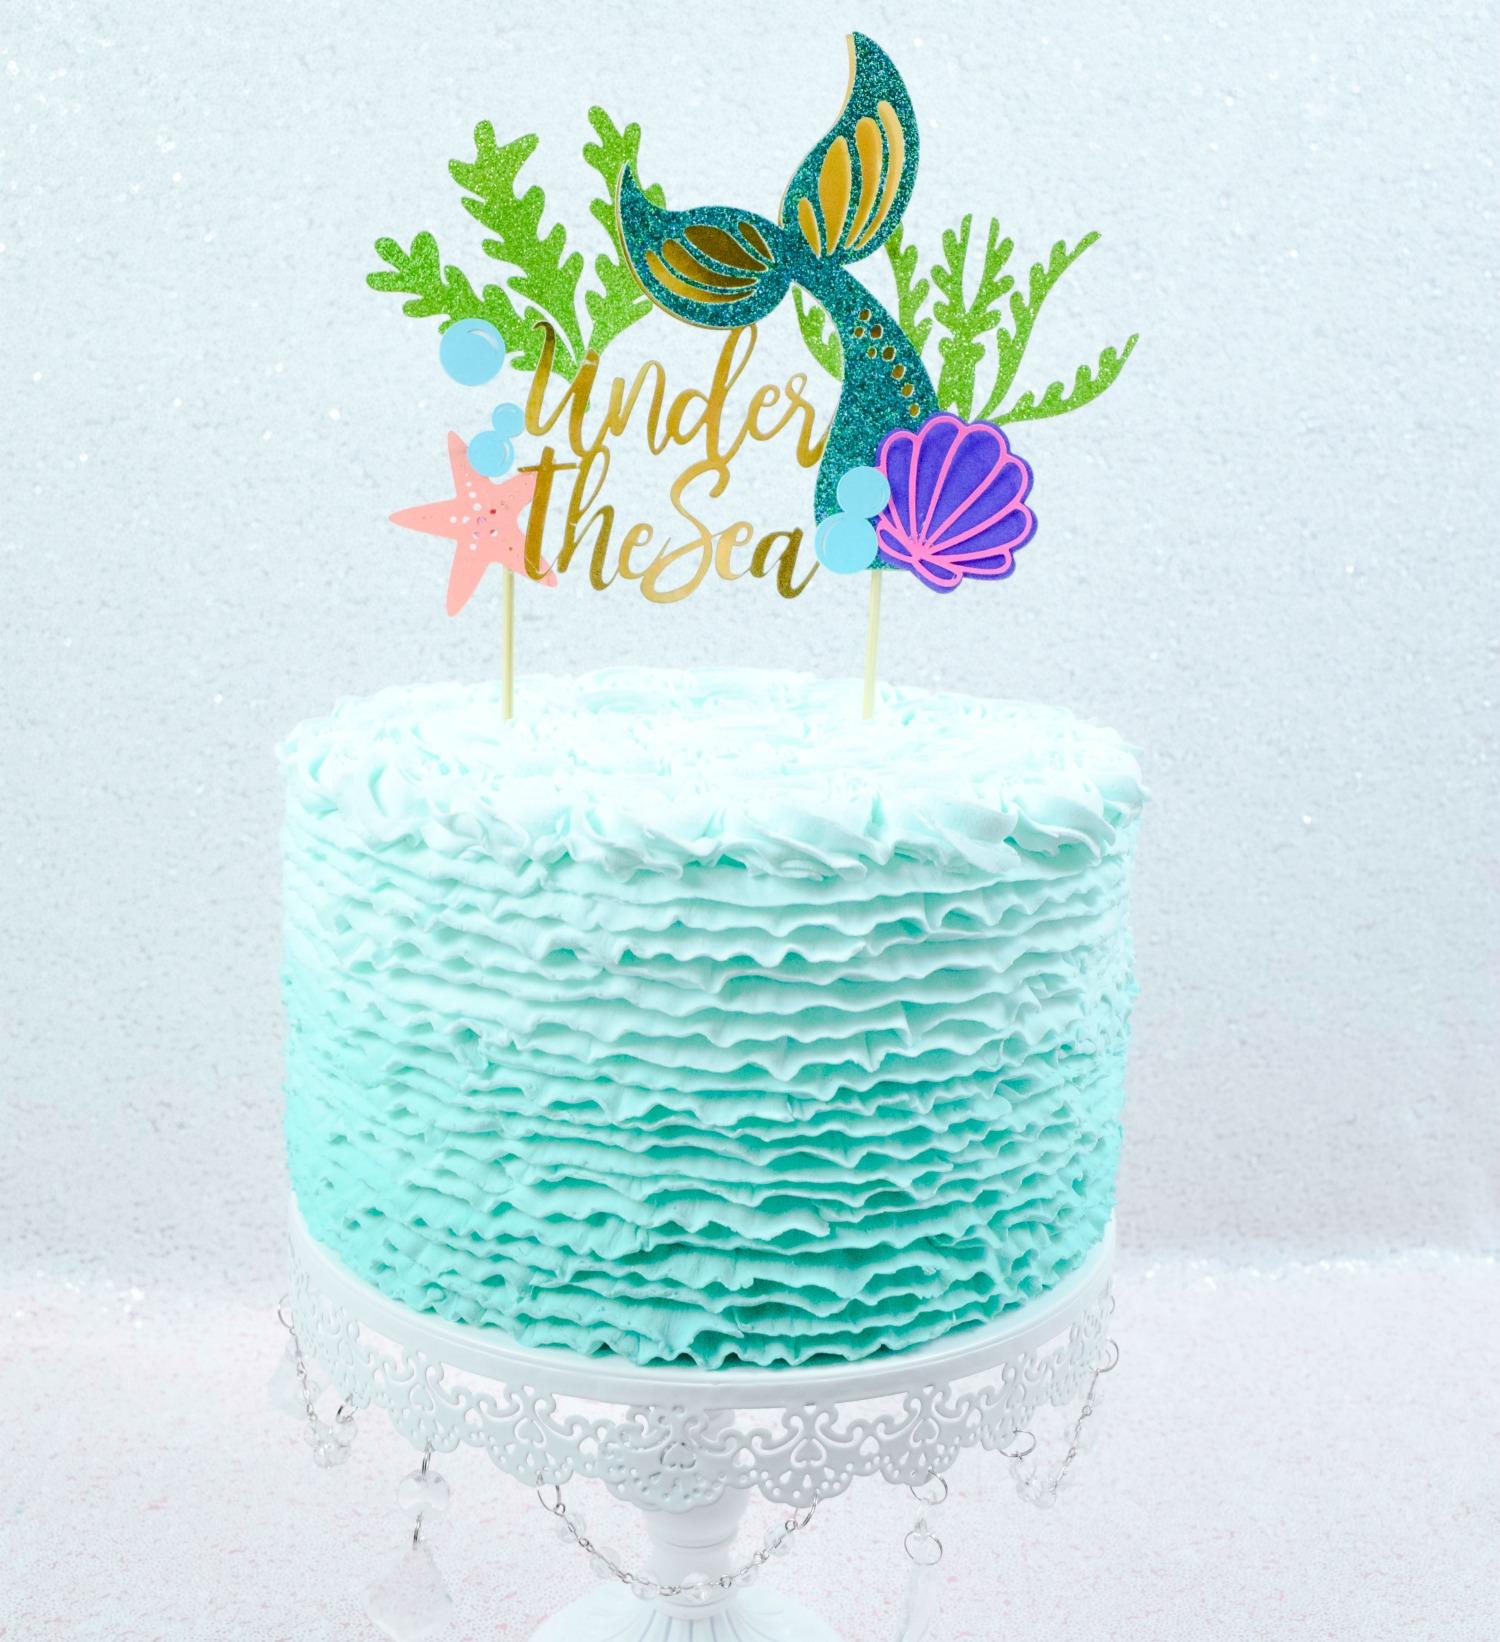 Mermaid Tail Cake Topper: DIY Birthday Cake Topper Tutorial